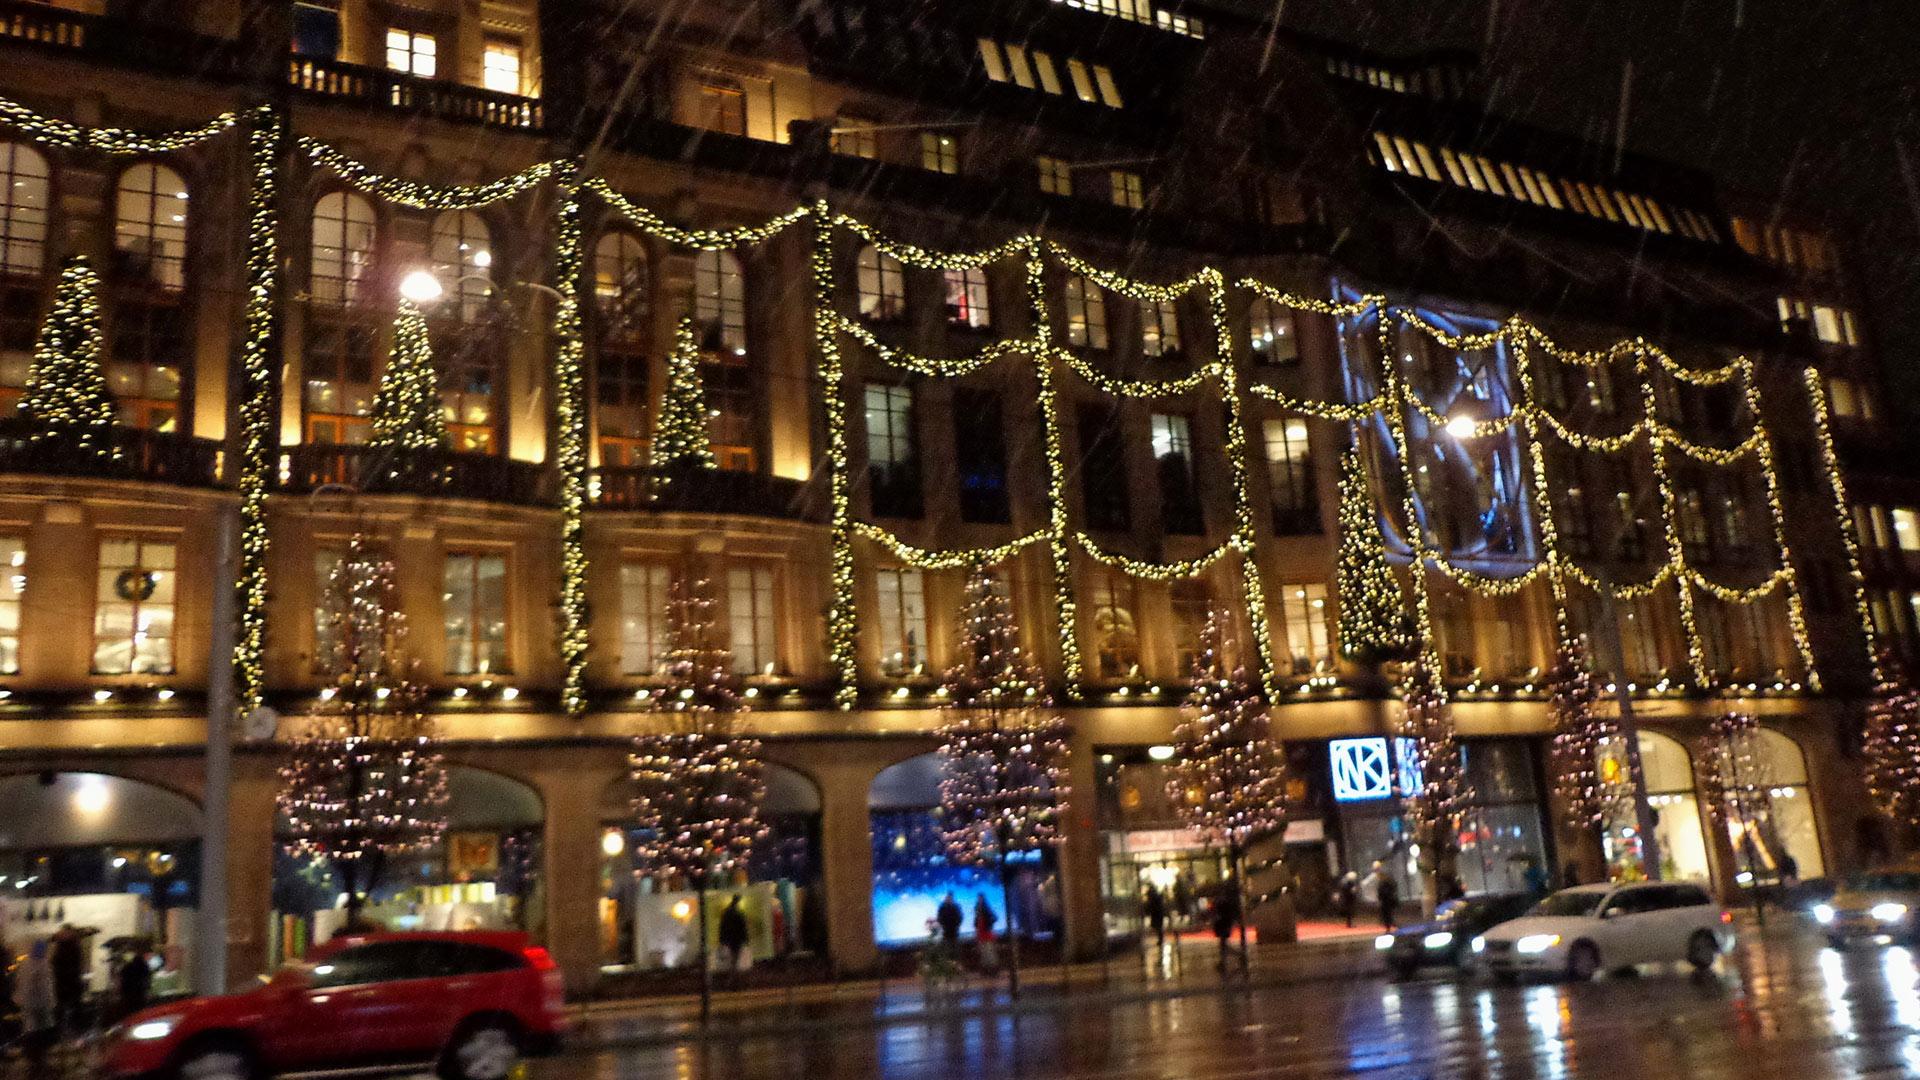 Festive Lights to Brighten the Swedish Winter